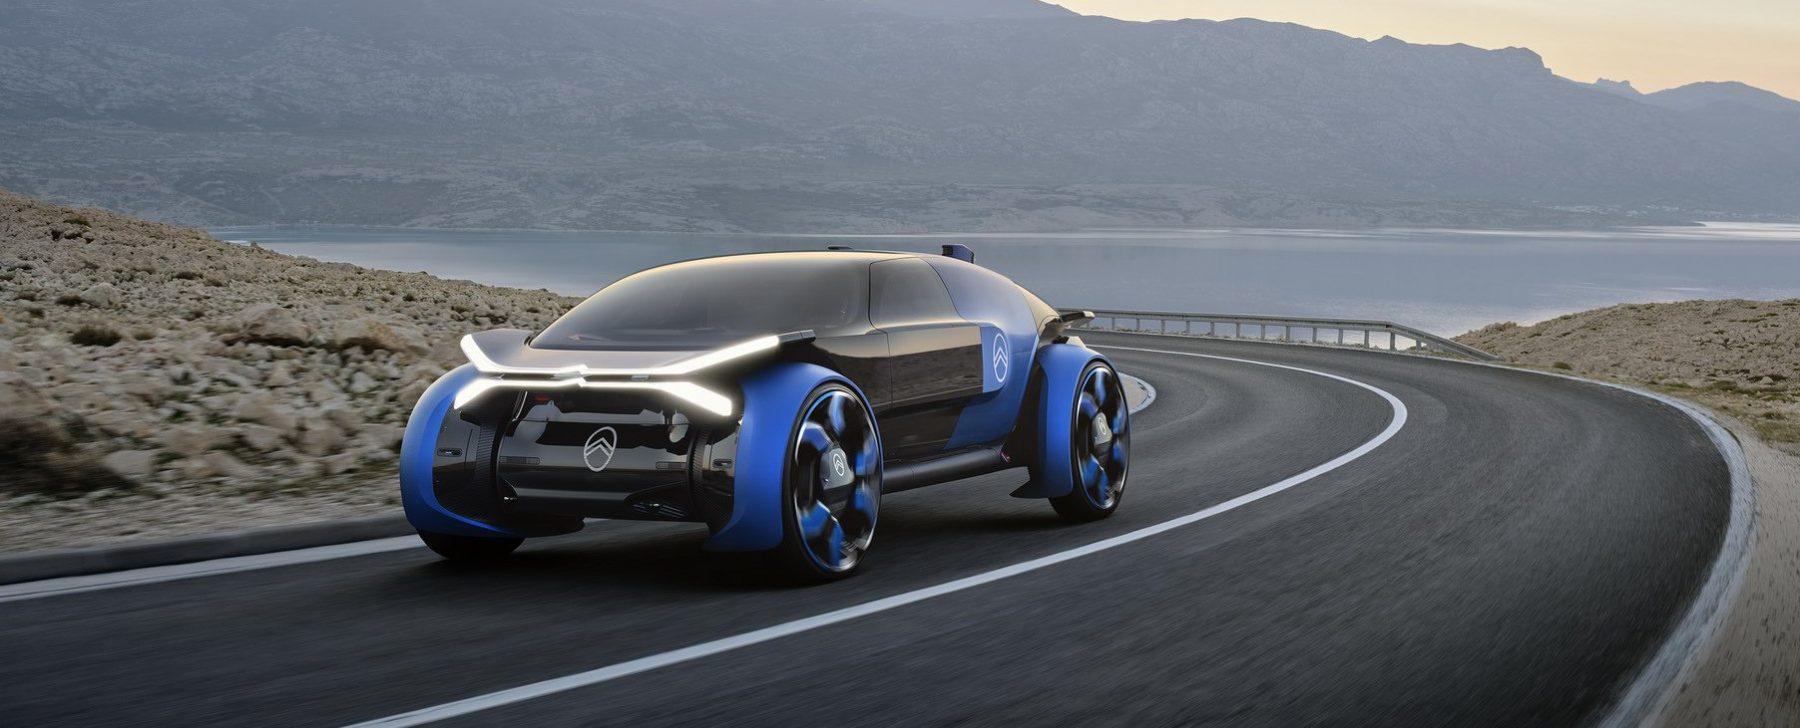 Citroen 19 19 Concept